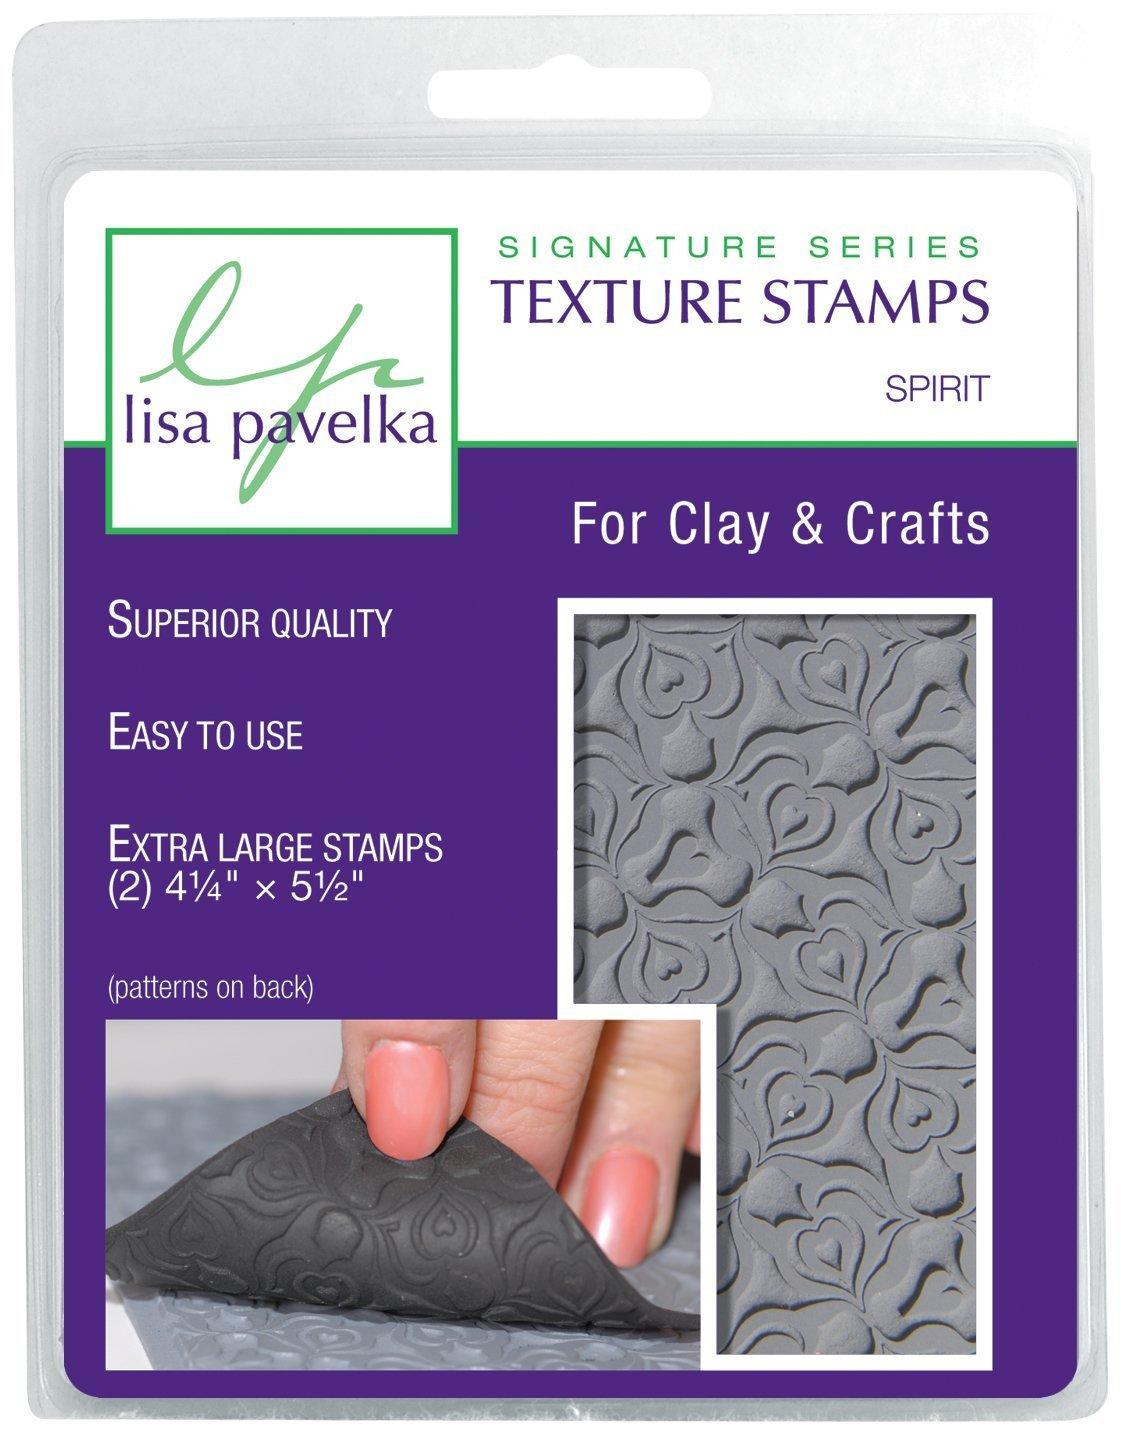 Lisa Pavelka Texture Stamp Kit Spirit (Style #073) The Great Create Inc.